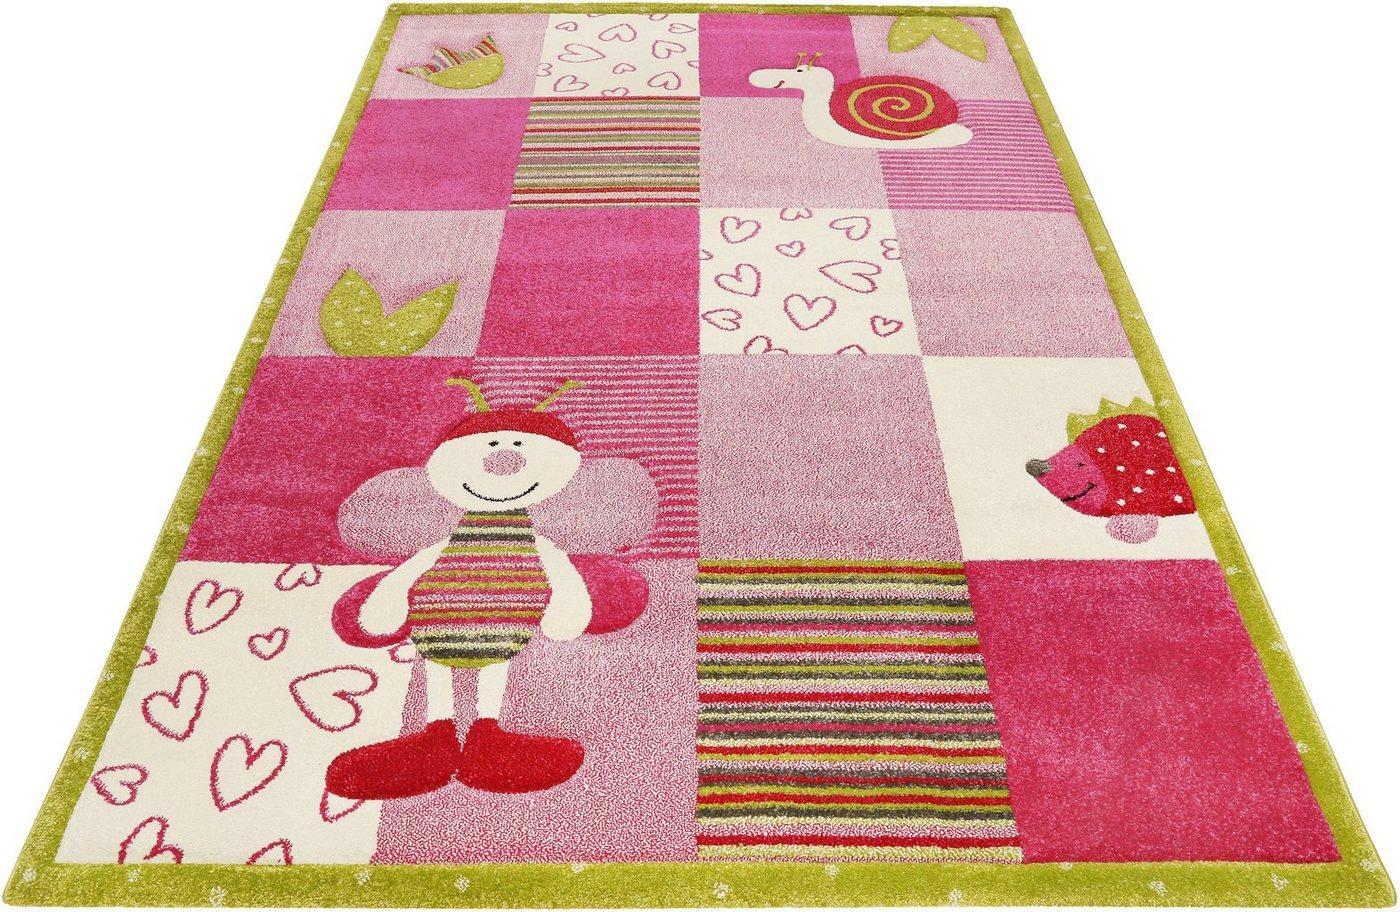 Kinderteppich »Kids Bee 2.0«, Esprit, rechteckig, Höhe 13 mm, Kinder Motiv Teppich, rosa